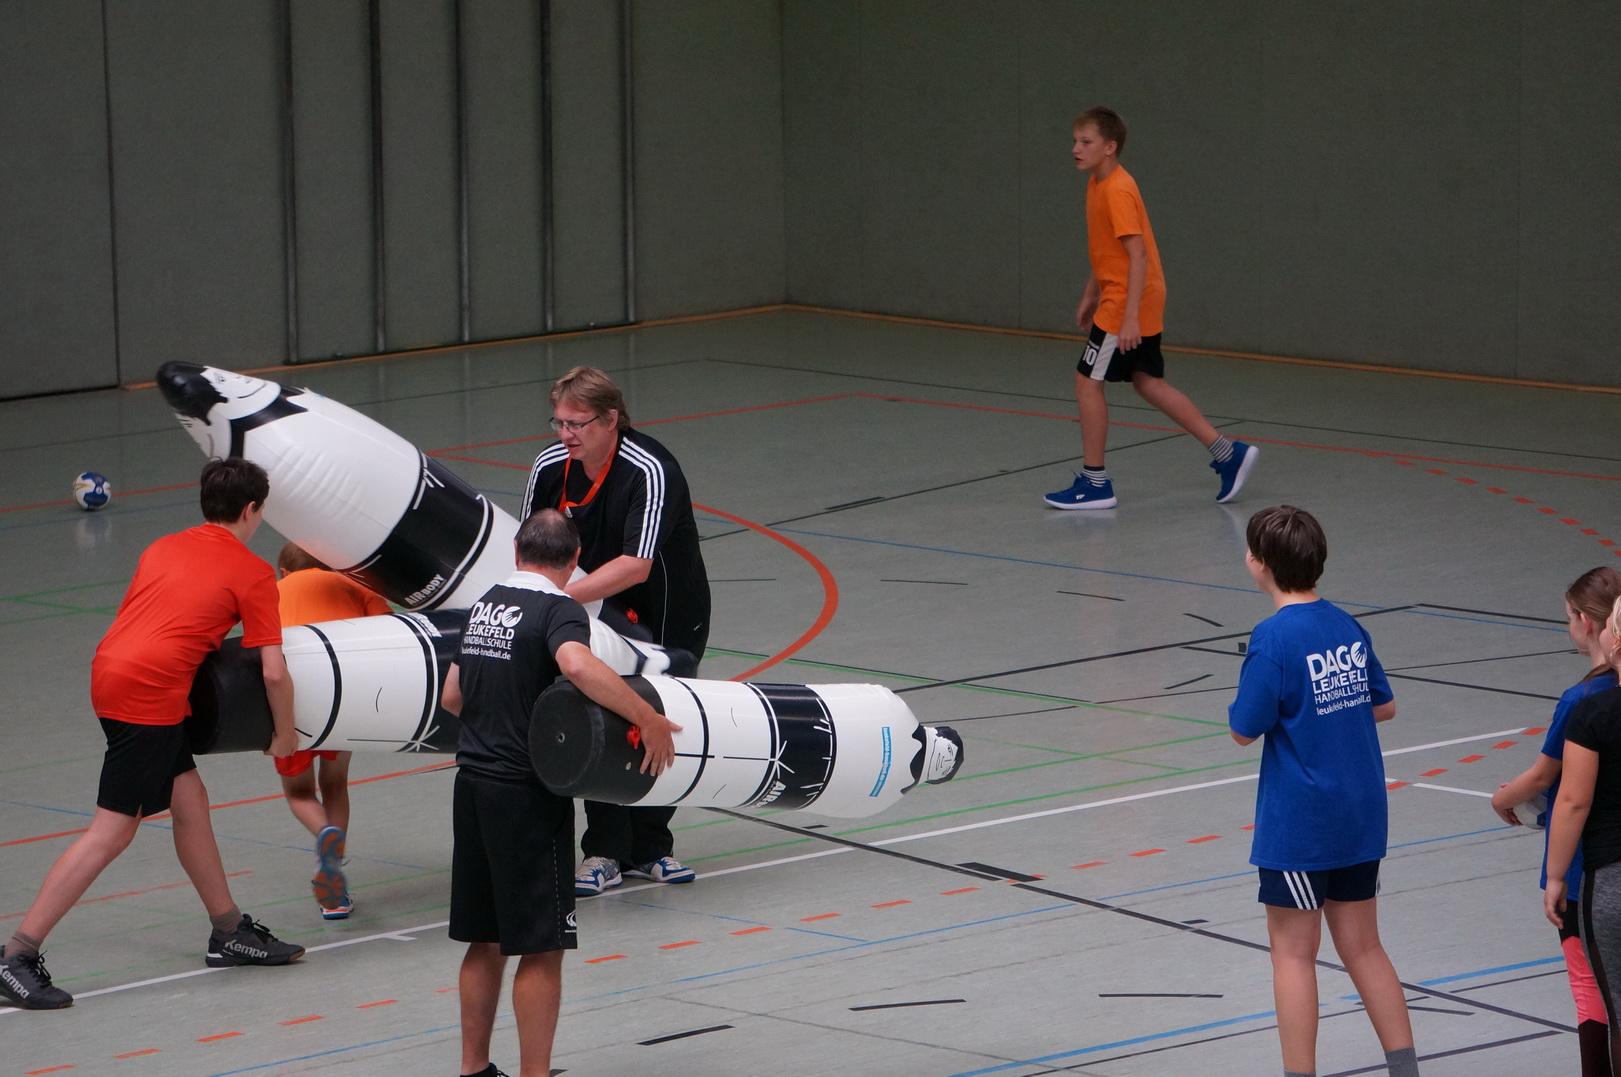 201808_Handballcamp_SDH_MG_261w